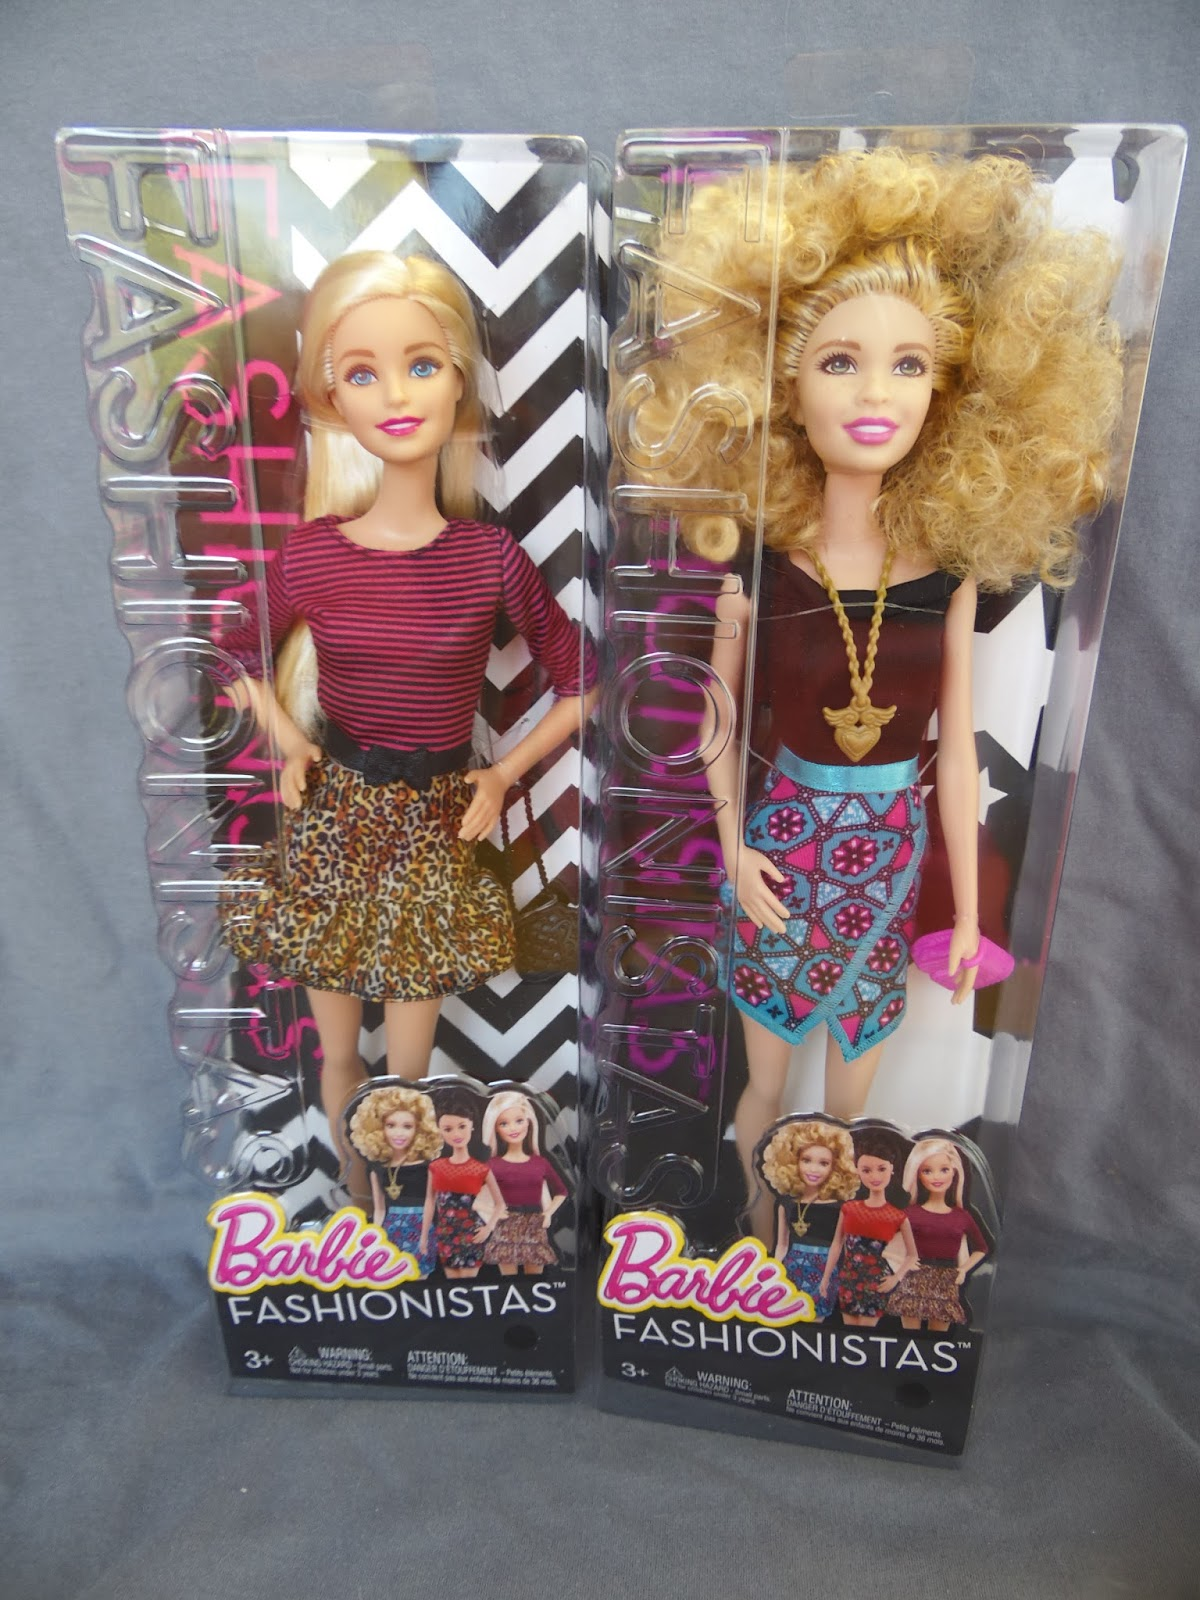 The Fashionomist The Hemline Index: Christina Articulates: Barbie Fashionistas